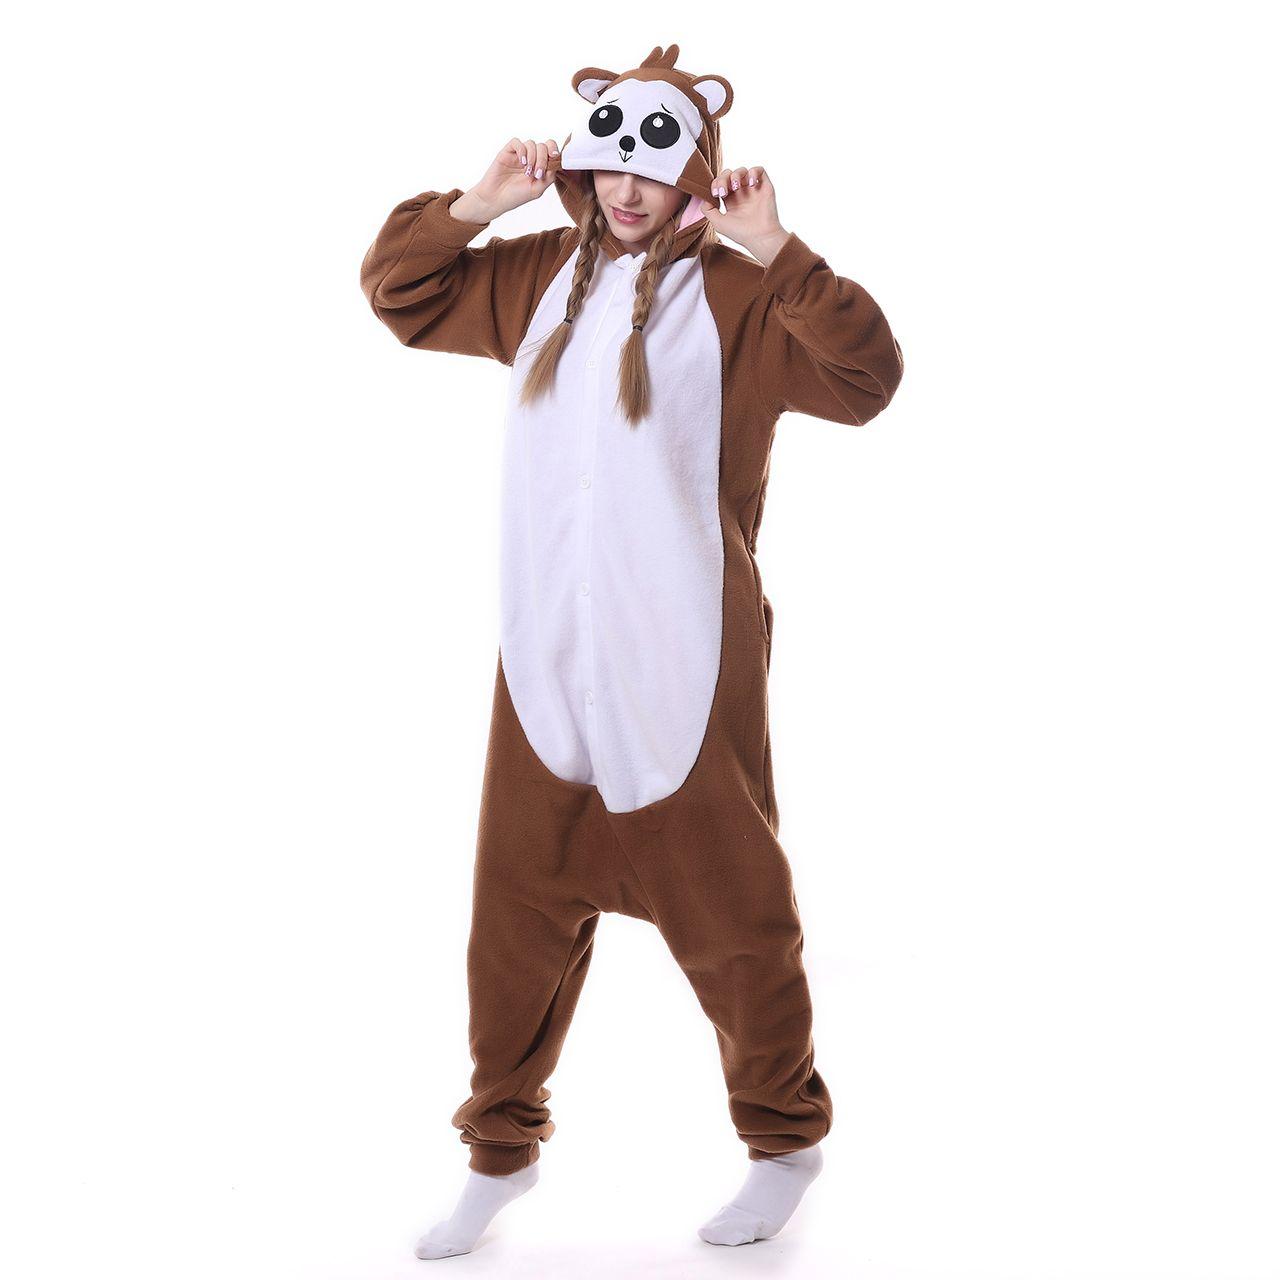 2017 Hooded Cartoon Pajamas Women Coffee Monkey Animal Hoodies Pyjamas Cute Fleece Full Sleeves Sleepwear Unisex